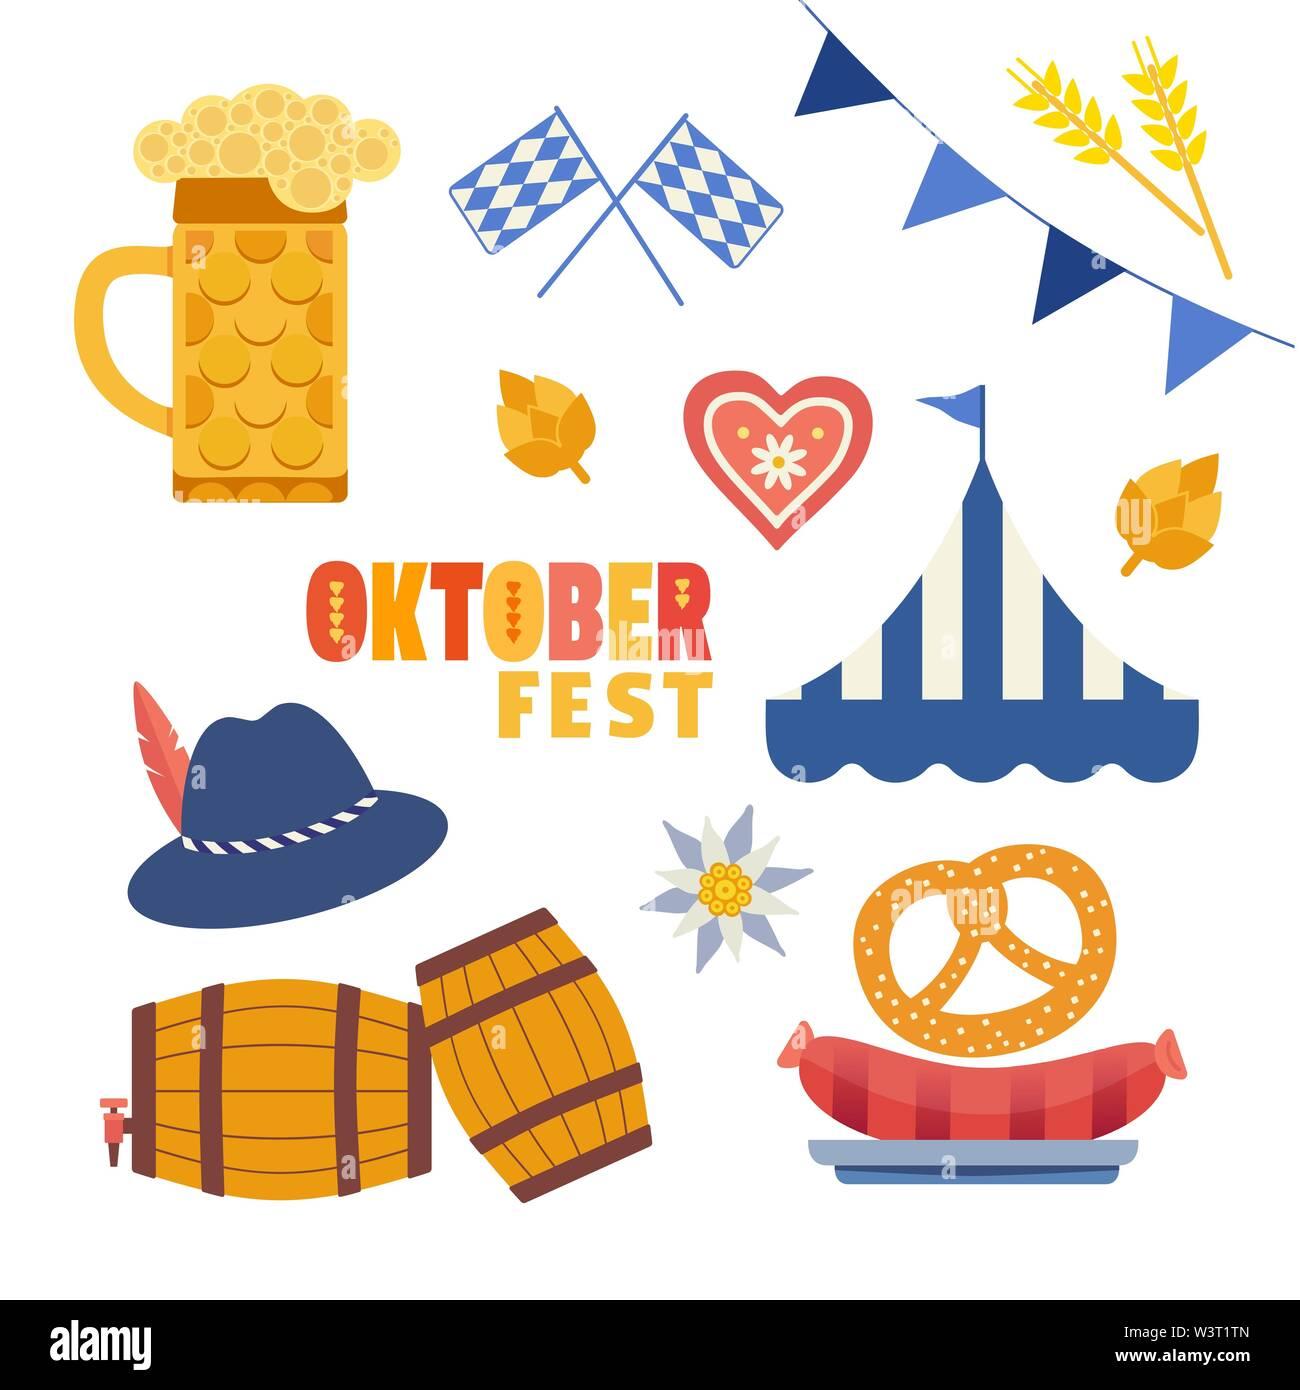 Oktoberfest hand drawn flat color vector icons set - Stock Image